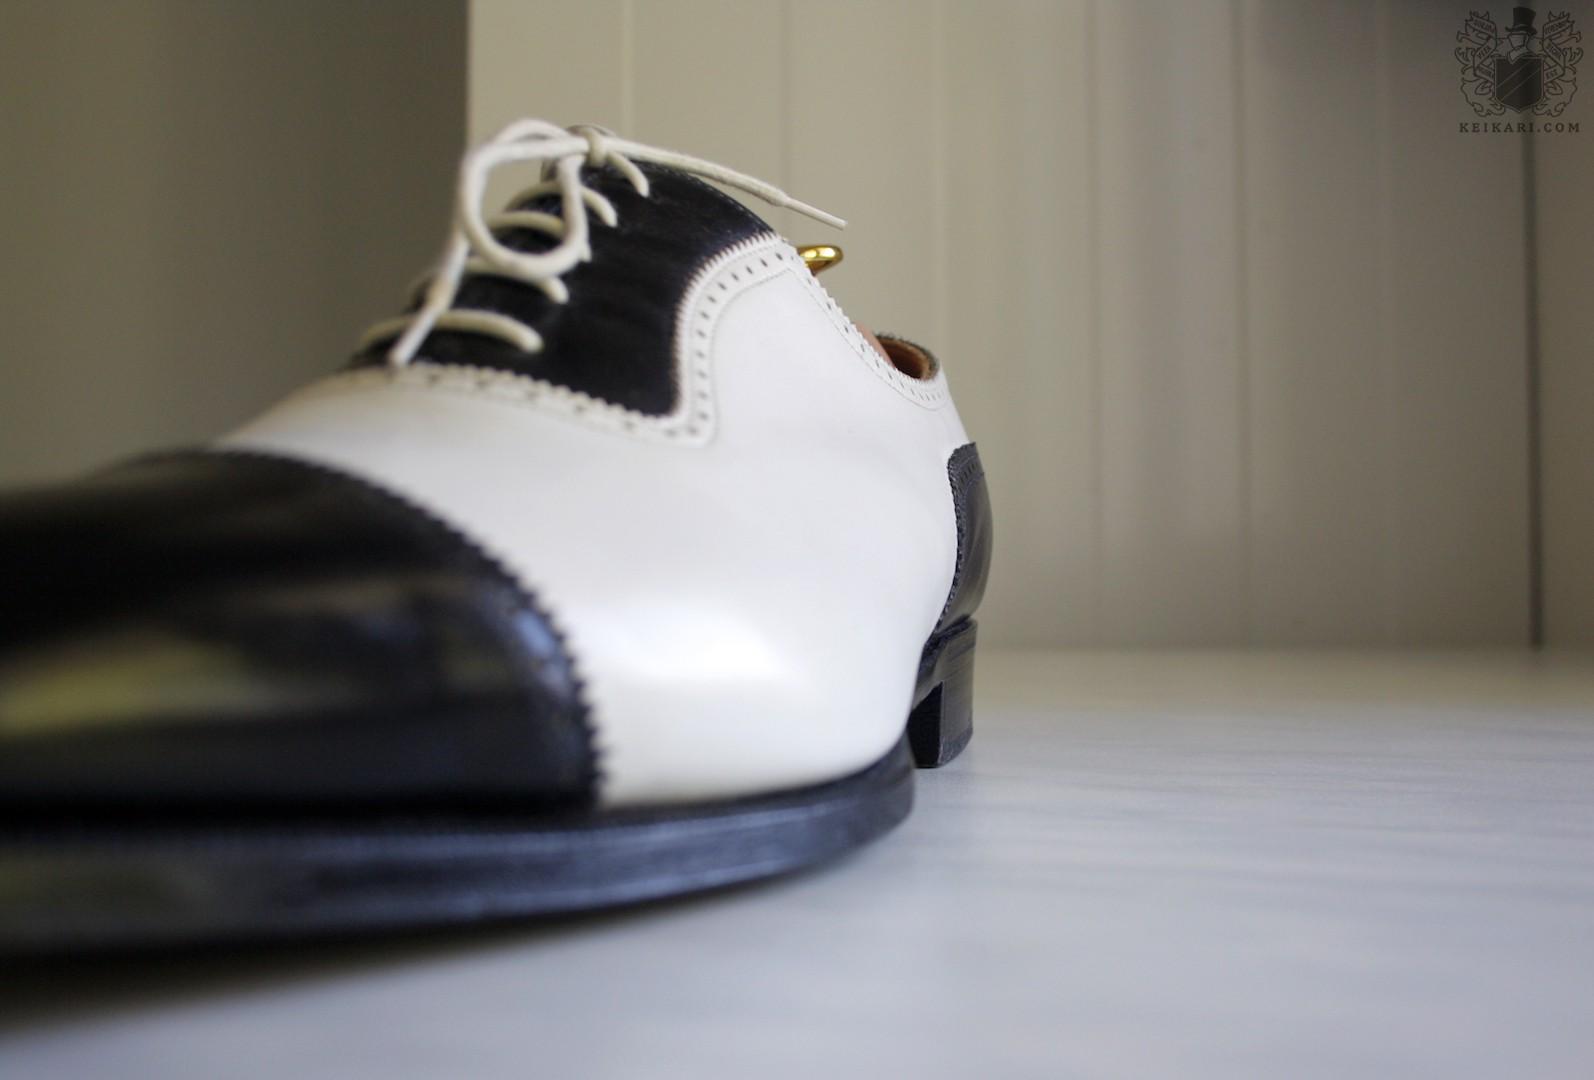 Edward_Green_blackwhite_prototype_spectator_shoes_from_Keikari_dot_com10.jpg